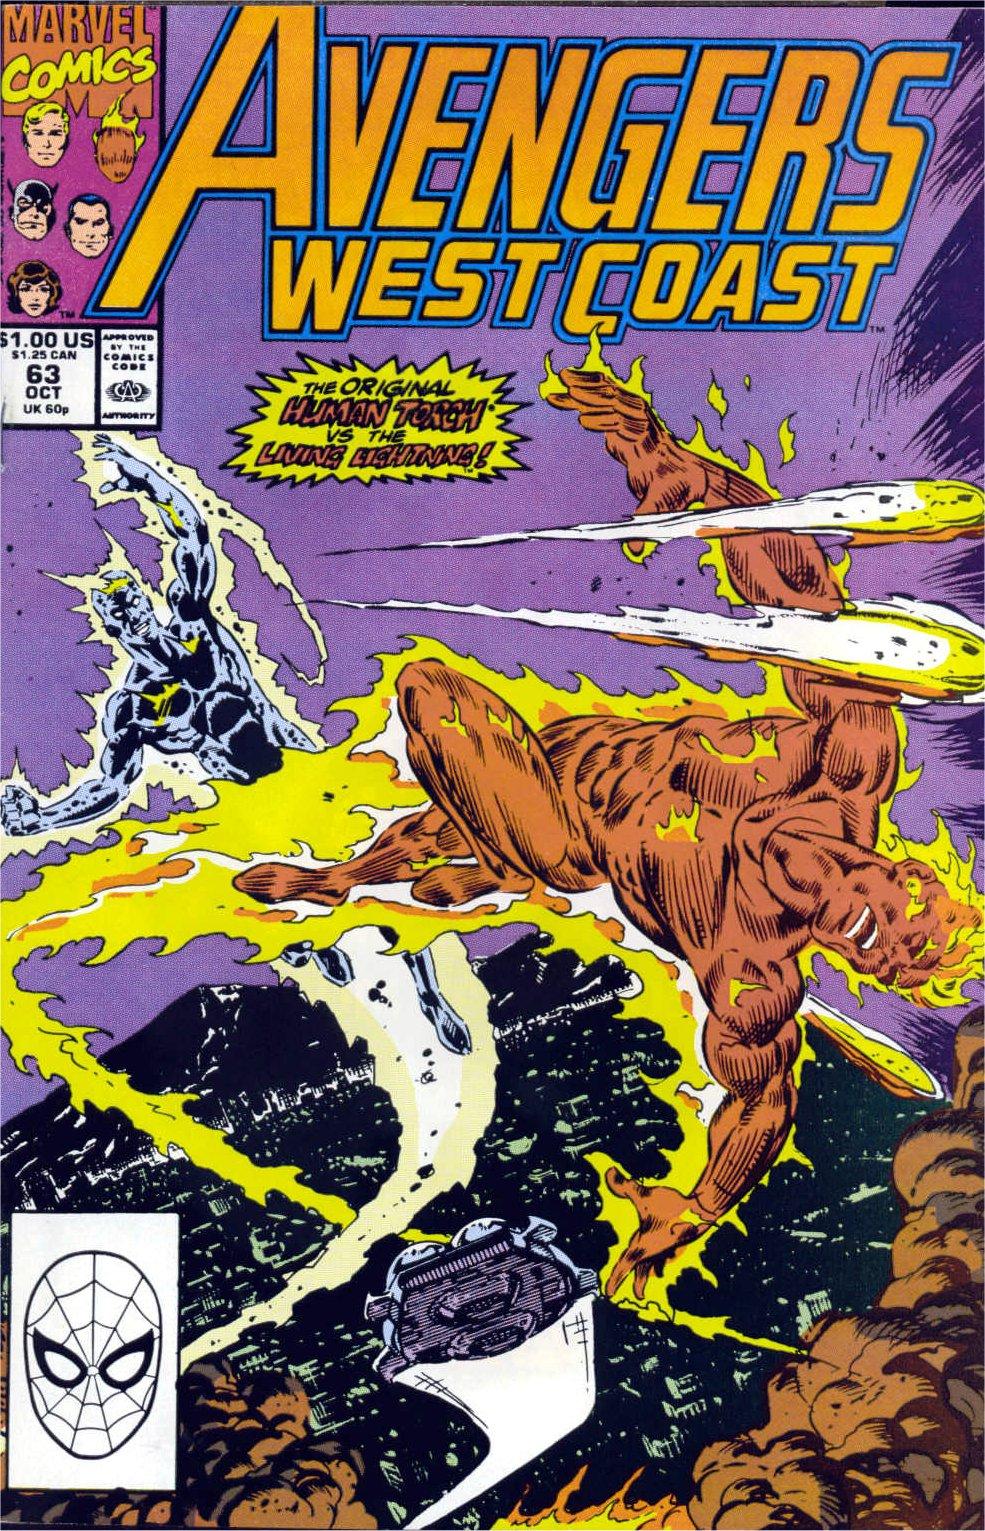 Avengers West Coast (1989) 63 Page 1